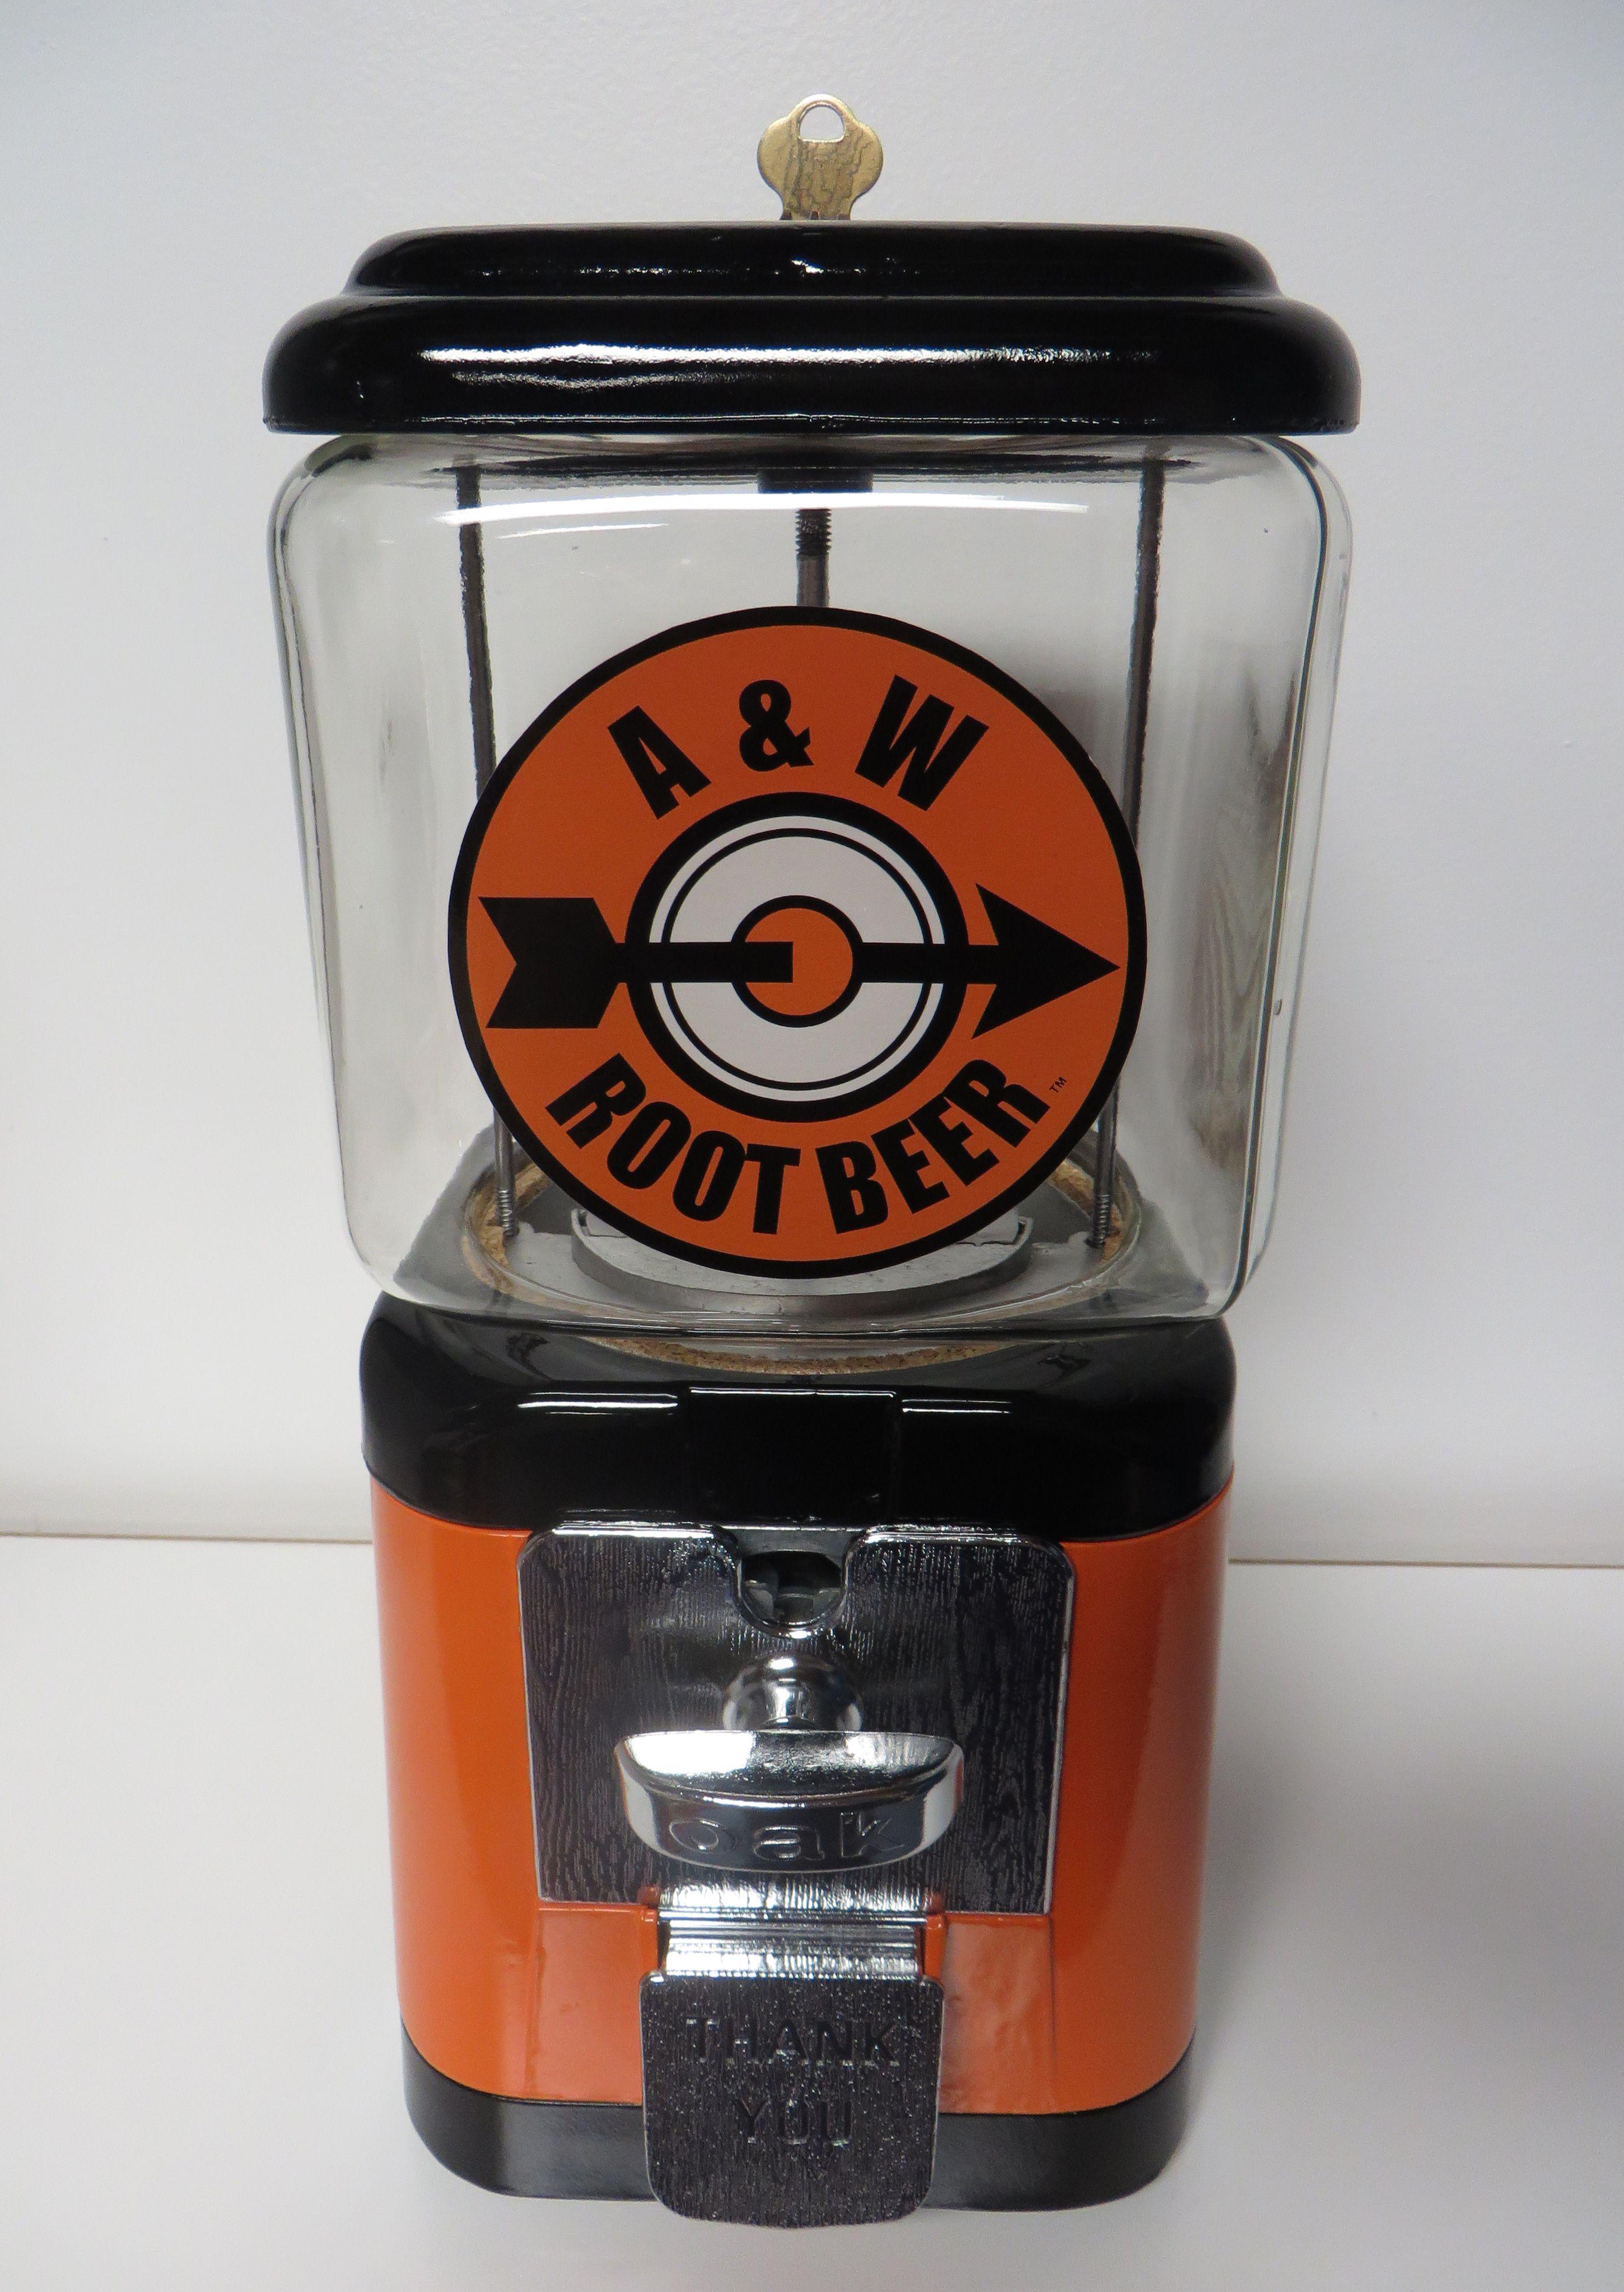 A&W Root Beer Gumball Machine. This vintage Oak Acorn